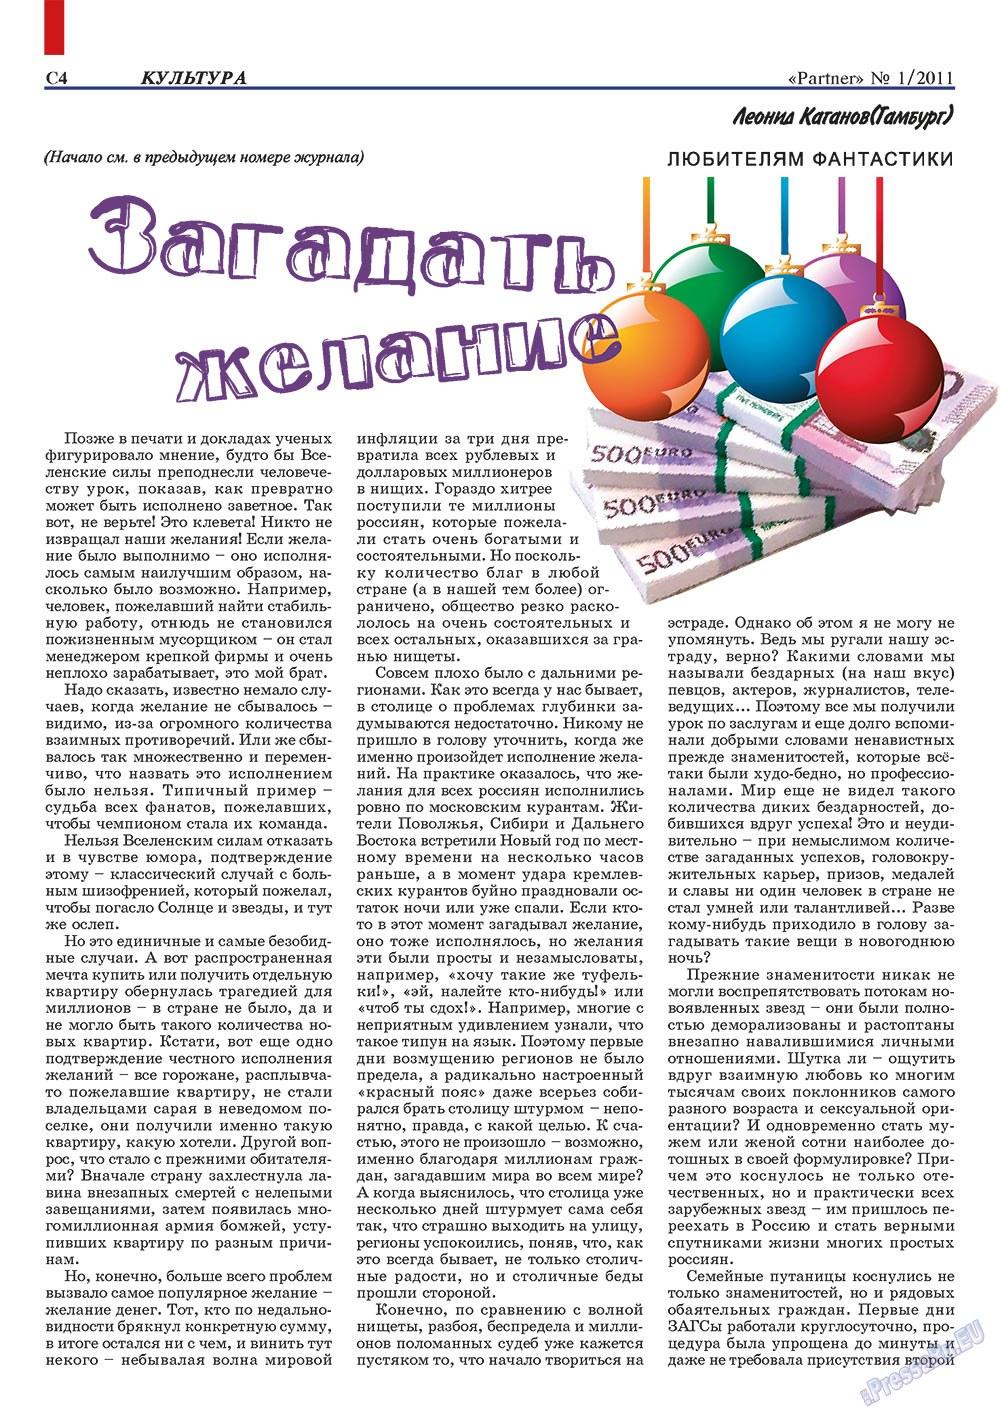 Партнер-север (журнал). 2011 год, номер 1, стр. 62